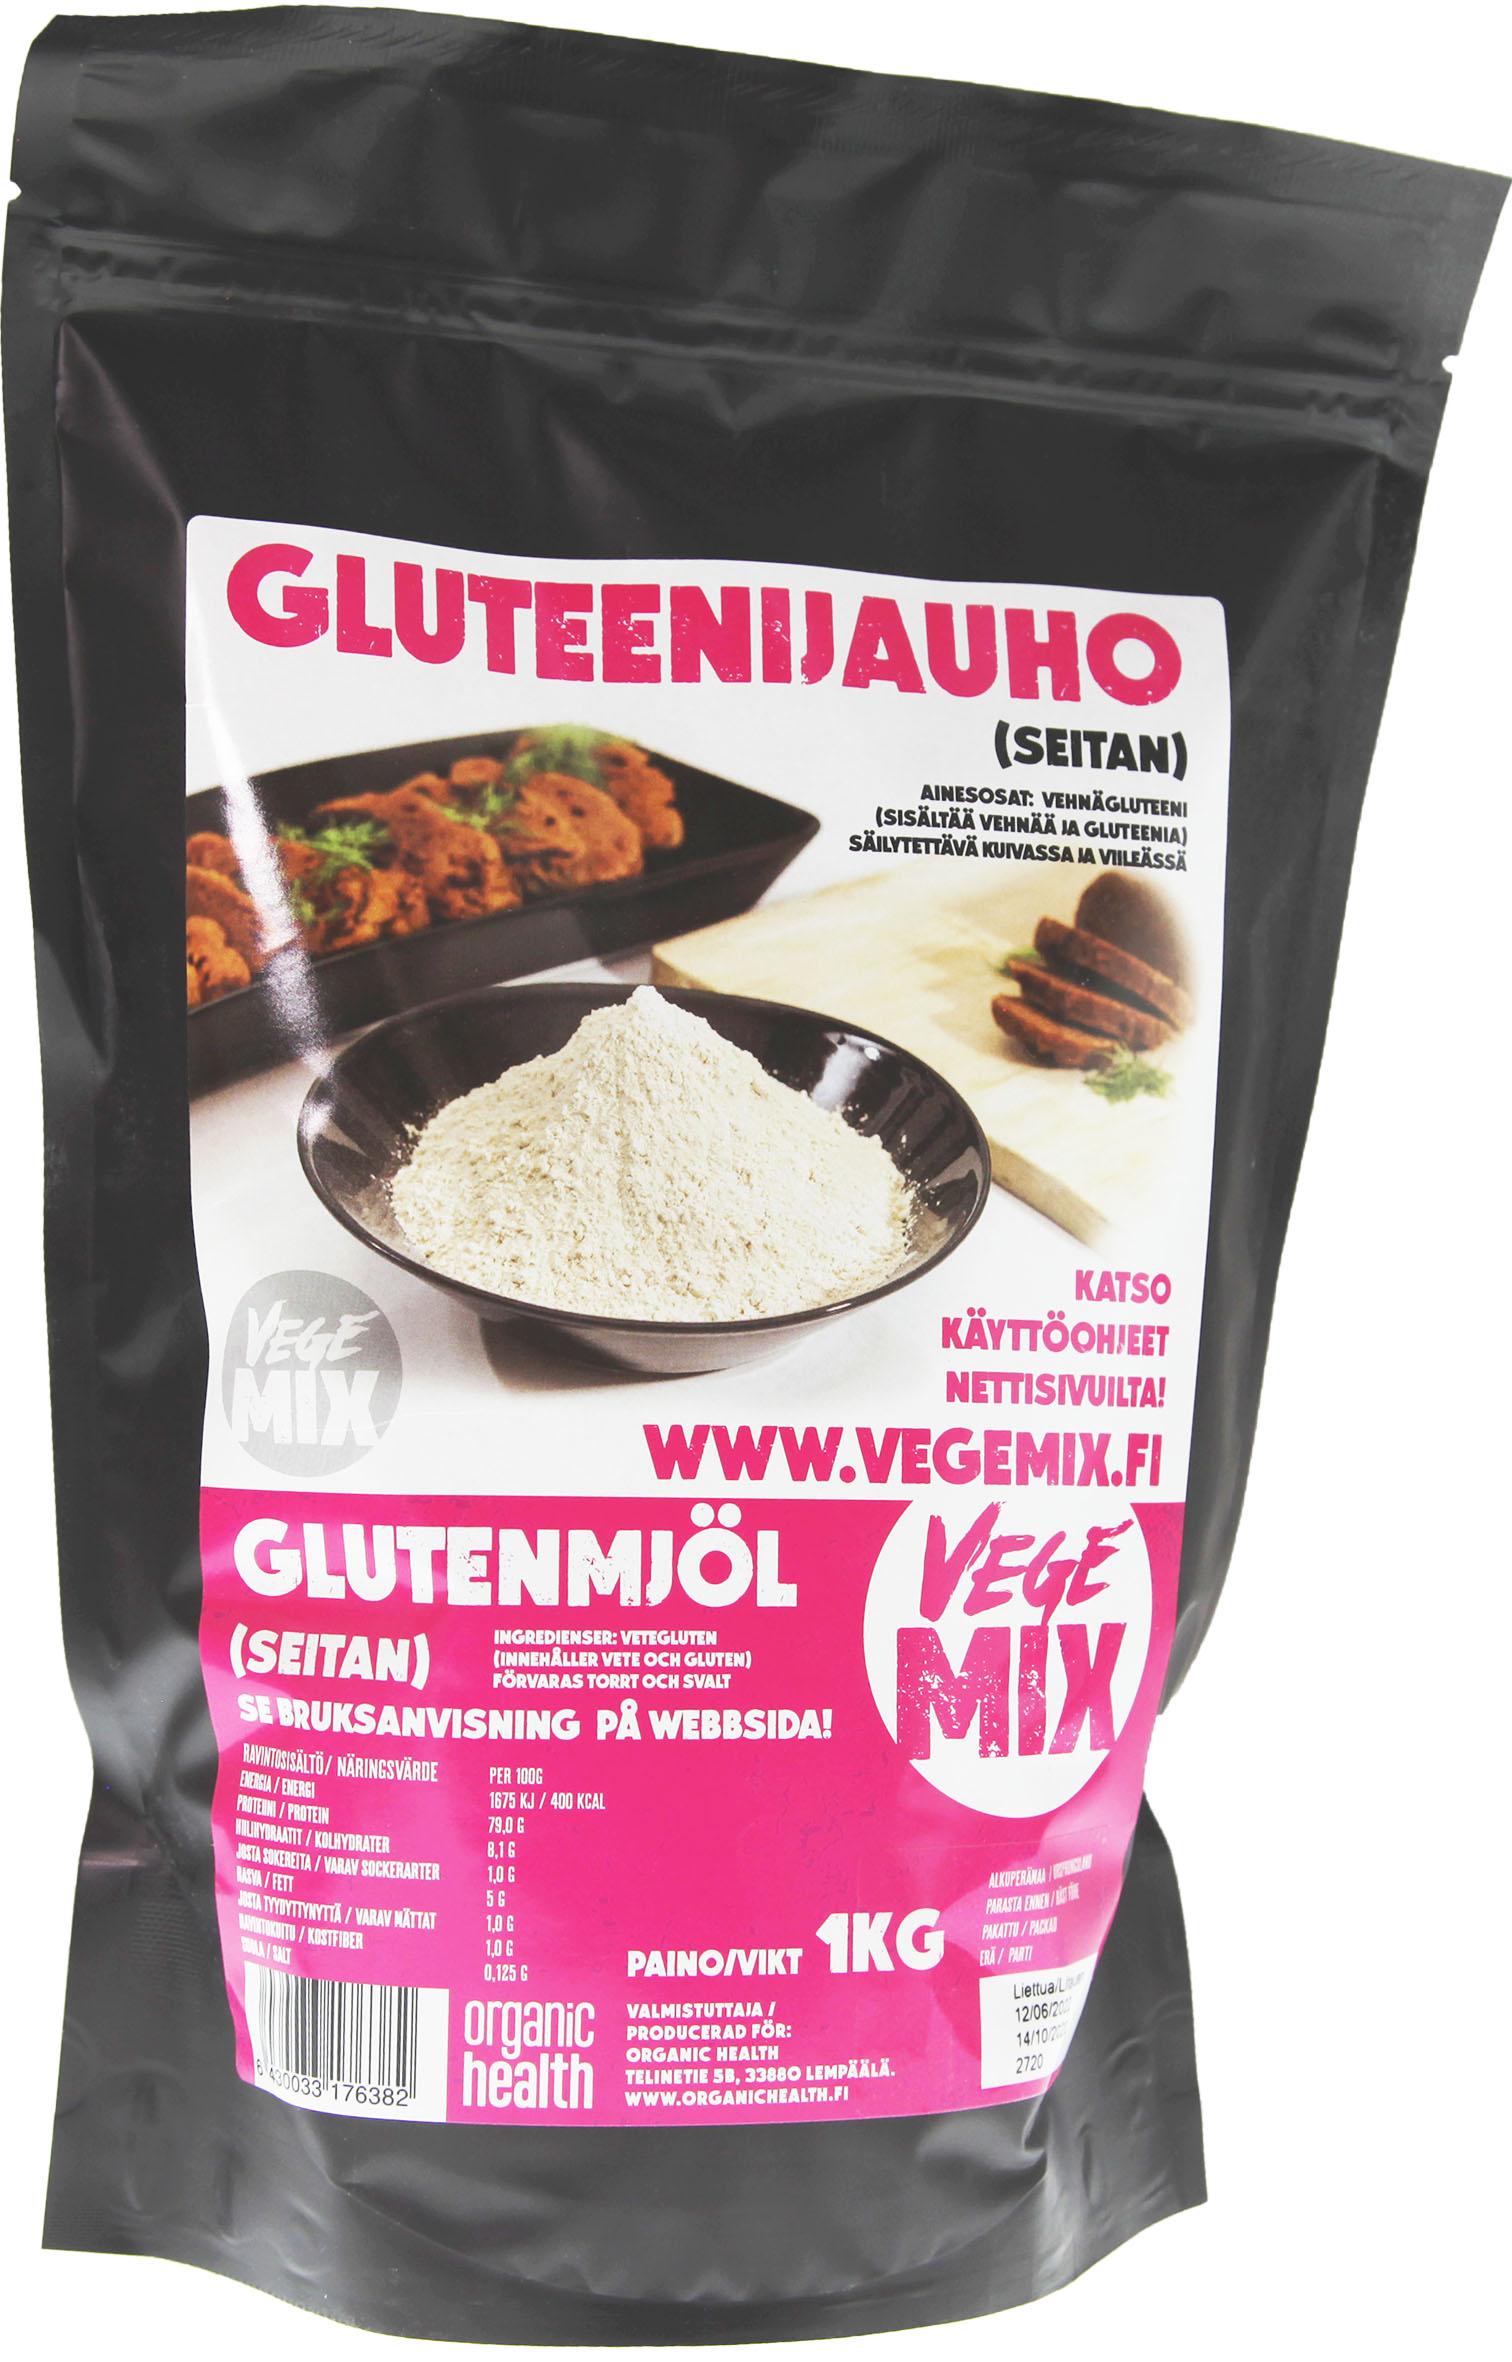 Gluteenijauho - Vegemix